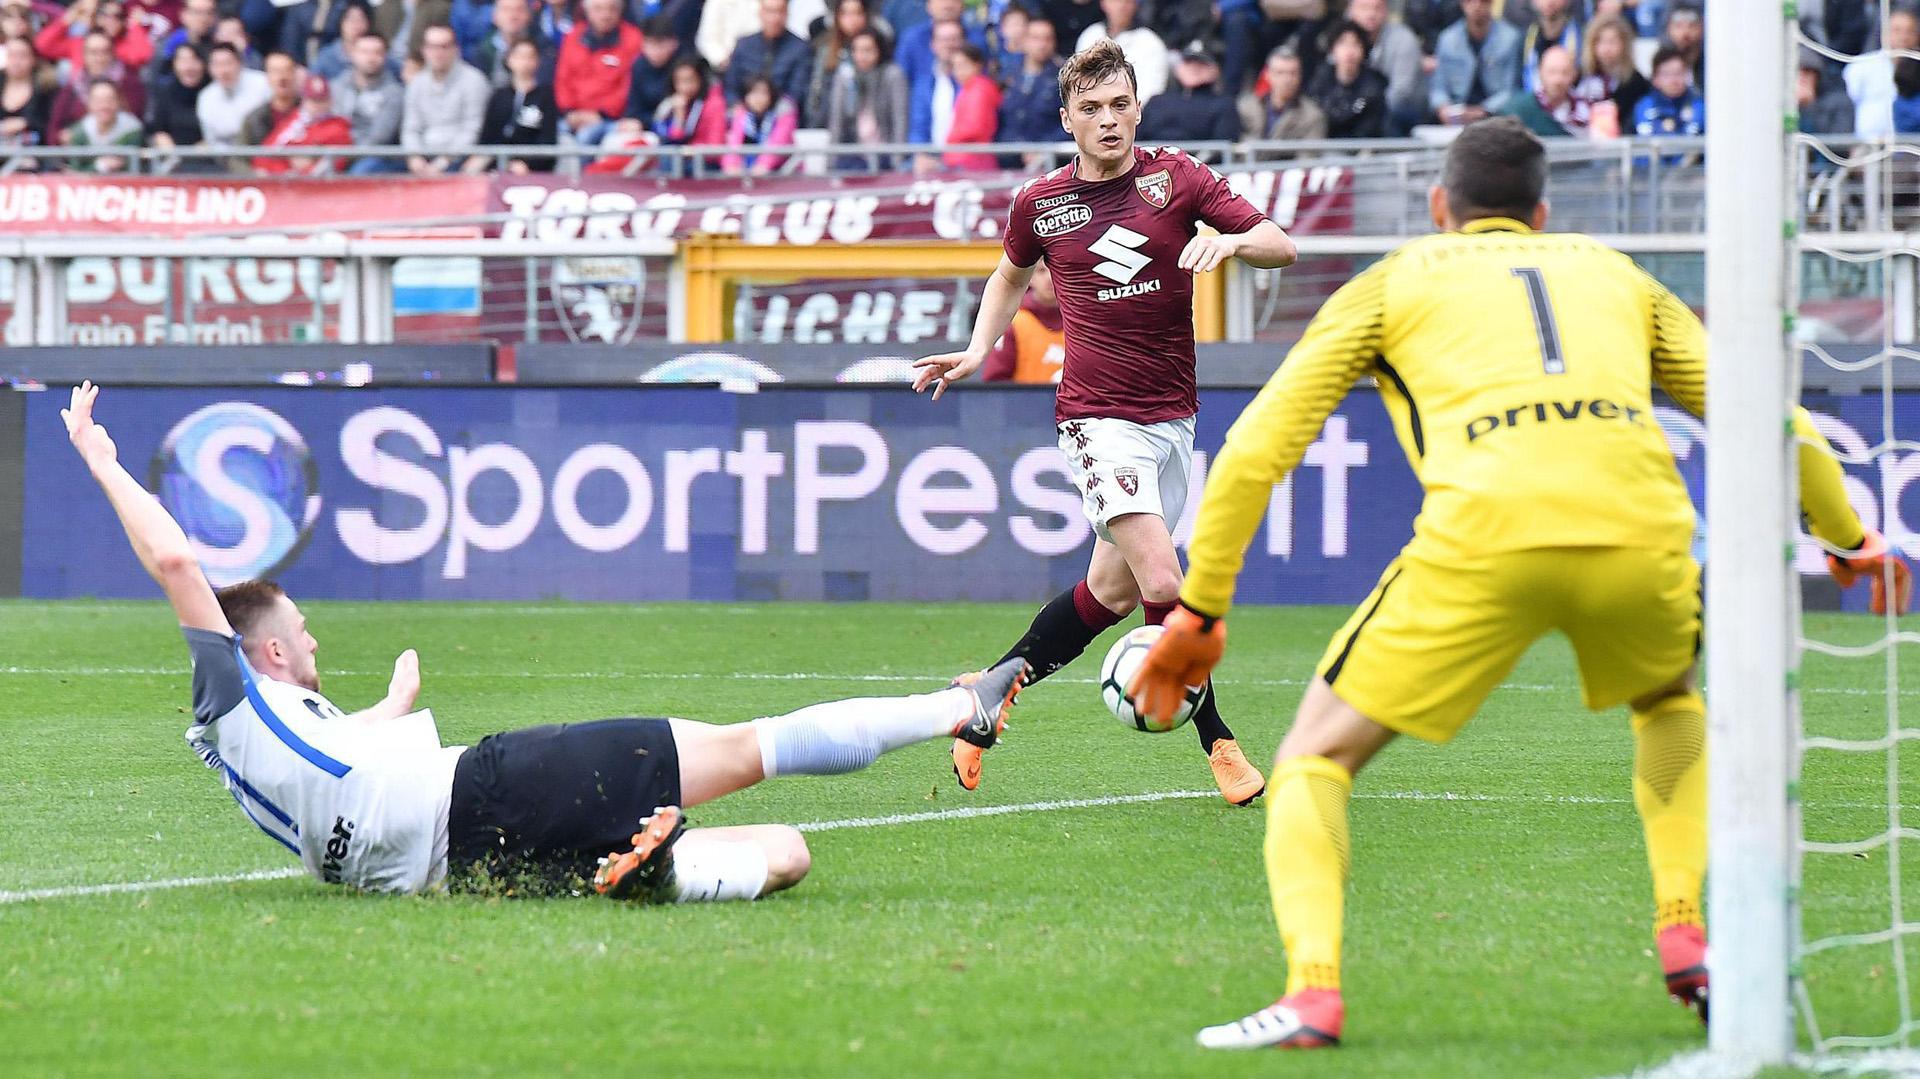 Adem Ljajic (R) marcó el gol del triunfo de Torino vs Inter en el clásico de la fecha 31° de la Liga de Italia ( EFE)